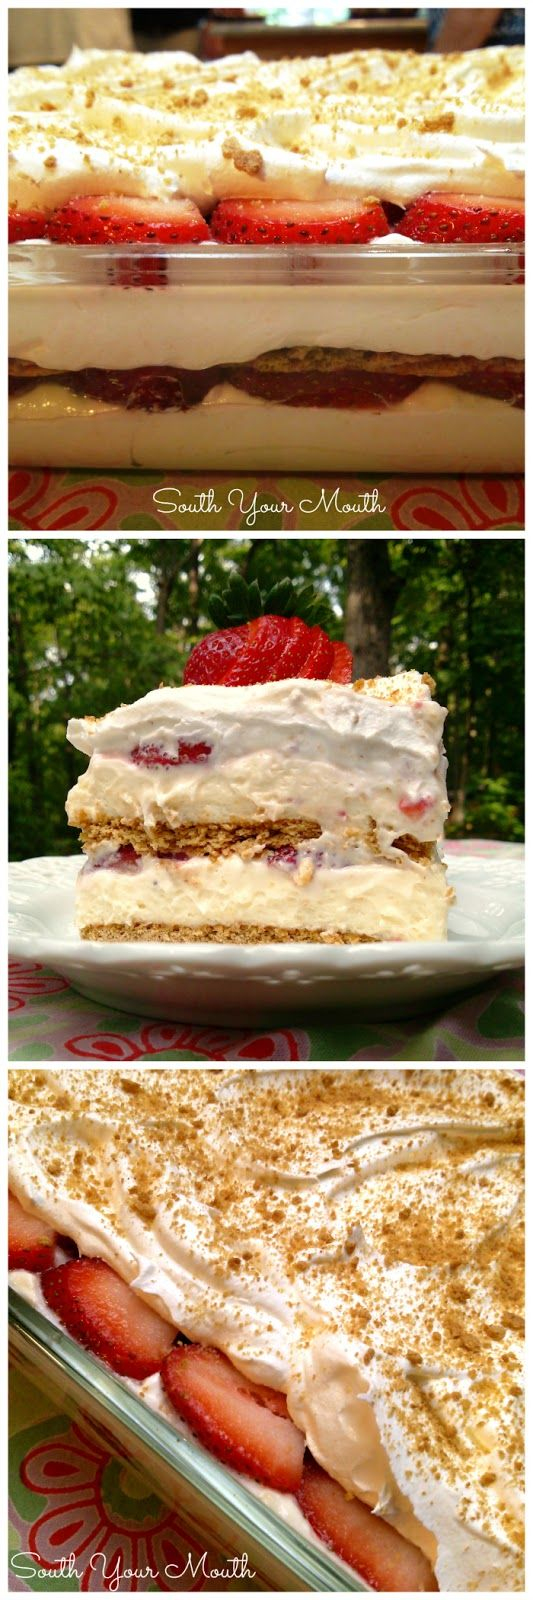 Strawberry Cream Cheese Icebox Cake Recipe - (southyourmouth)